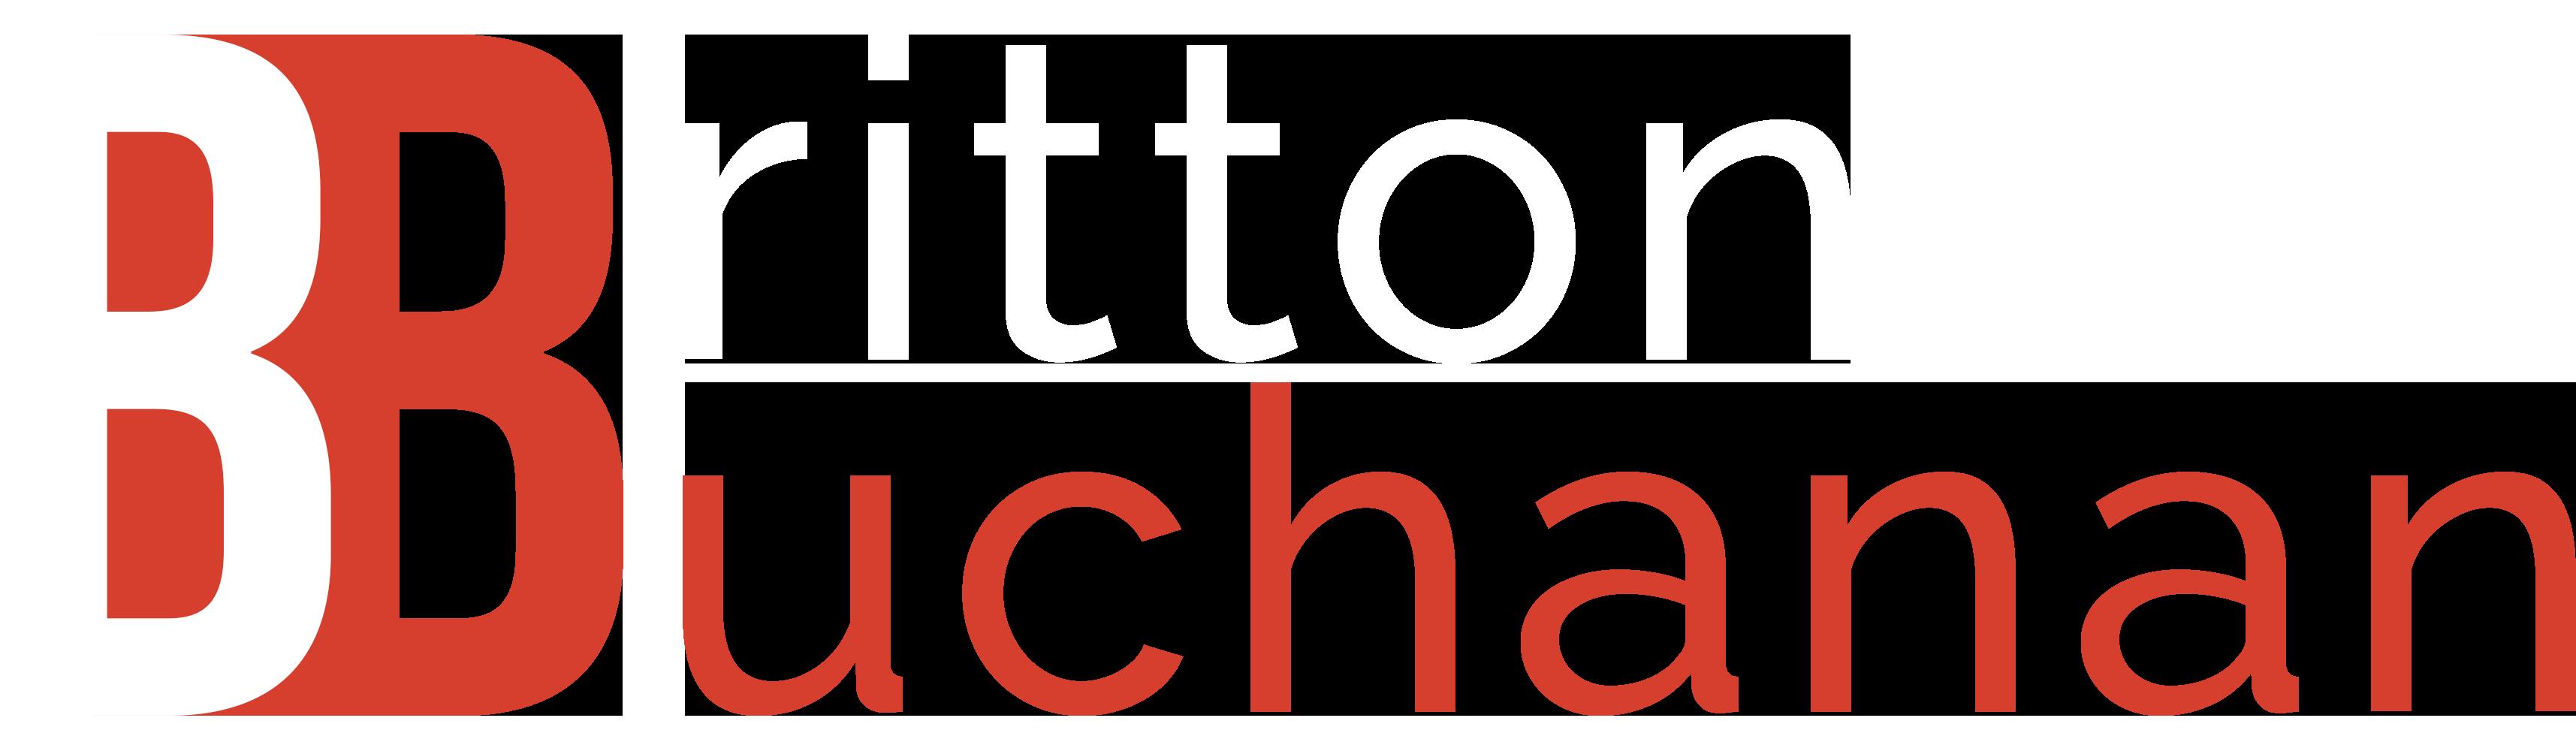 BrittonBuchanan.com